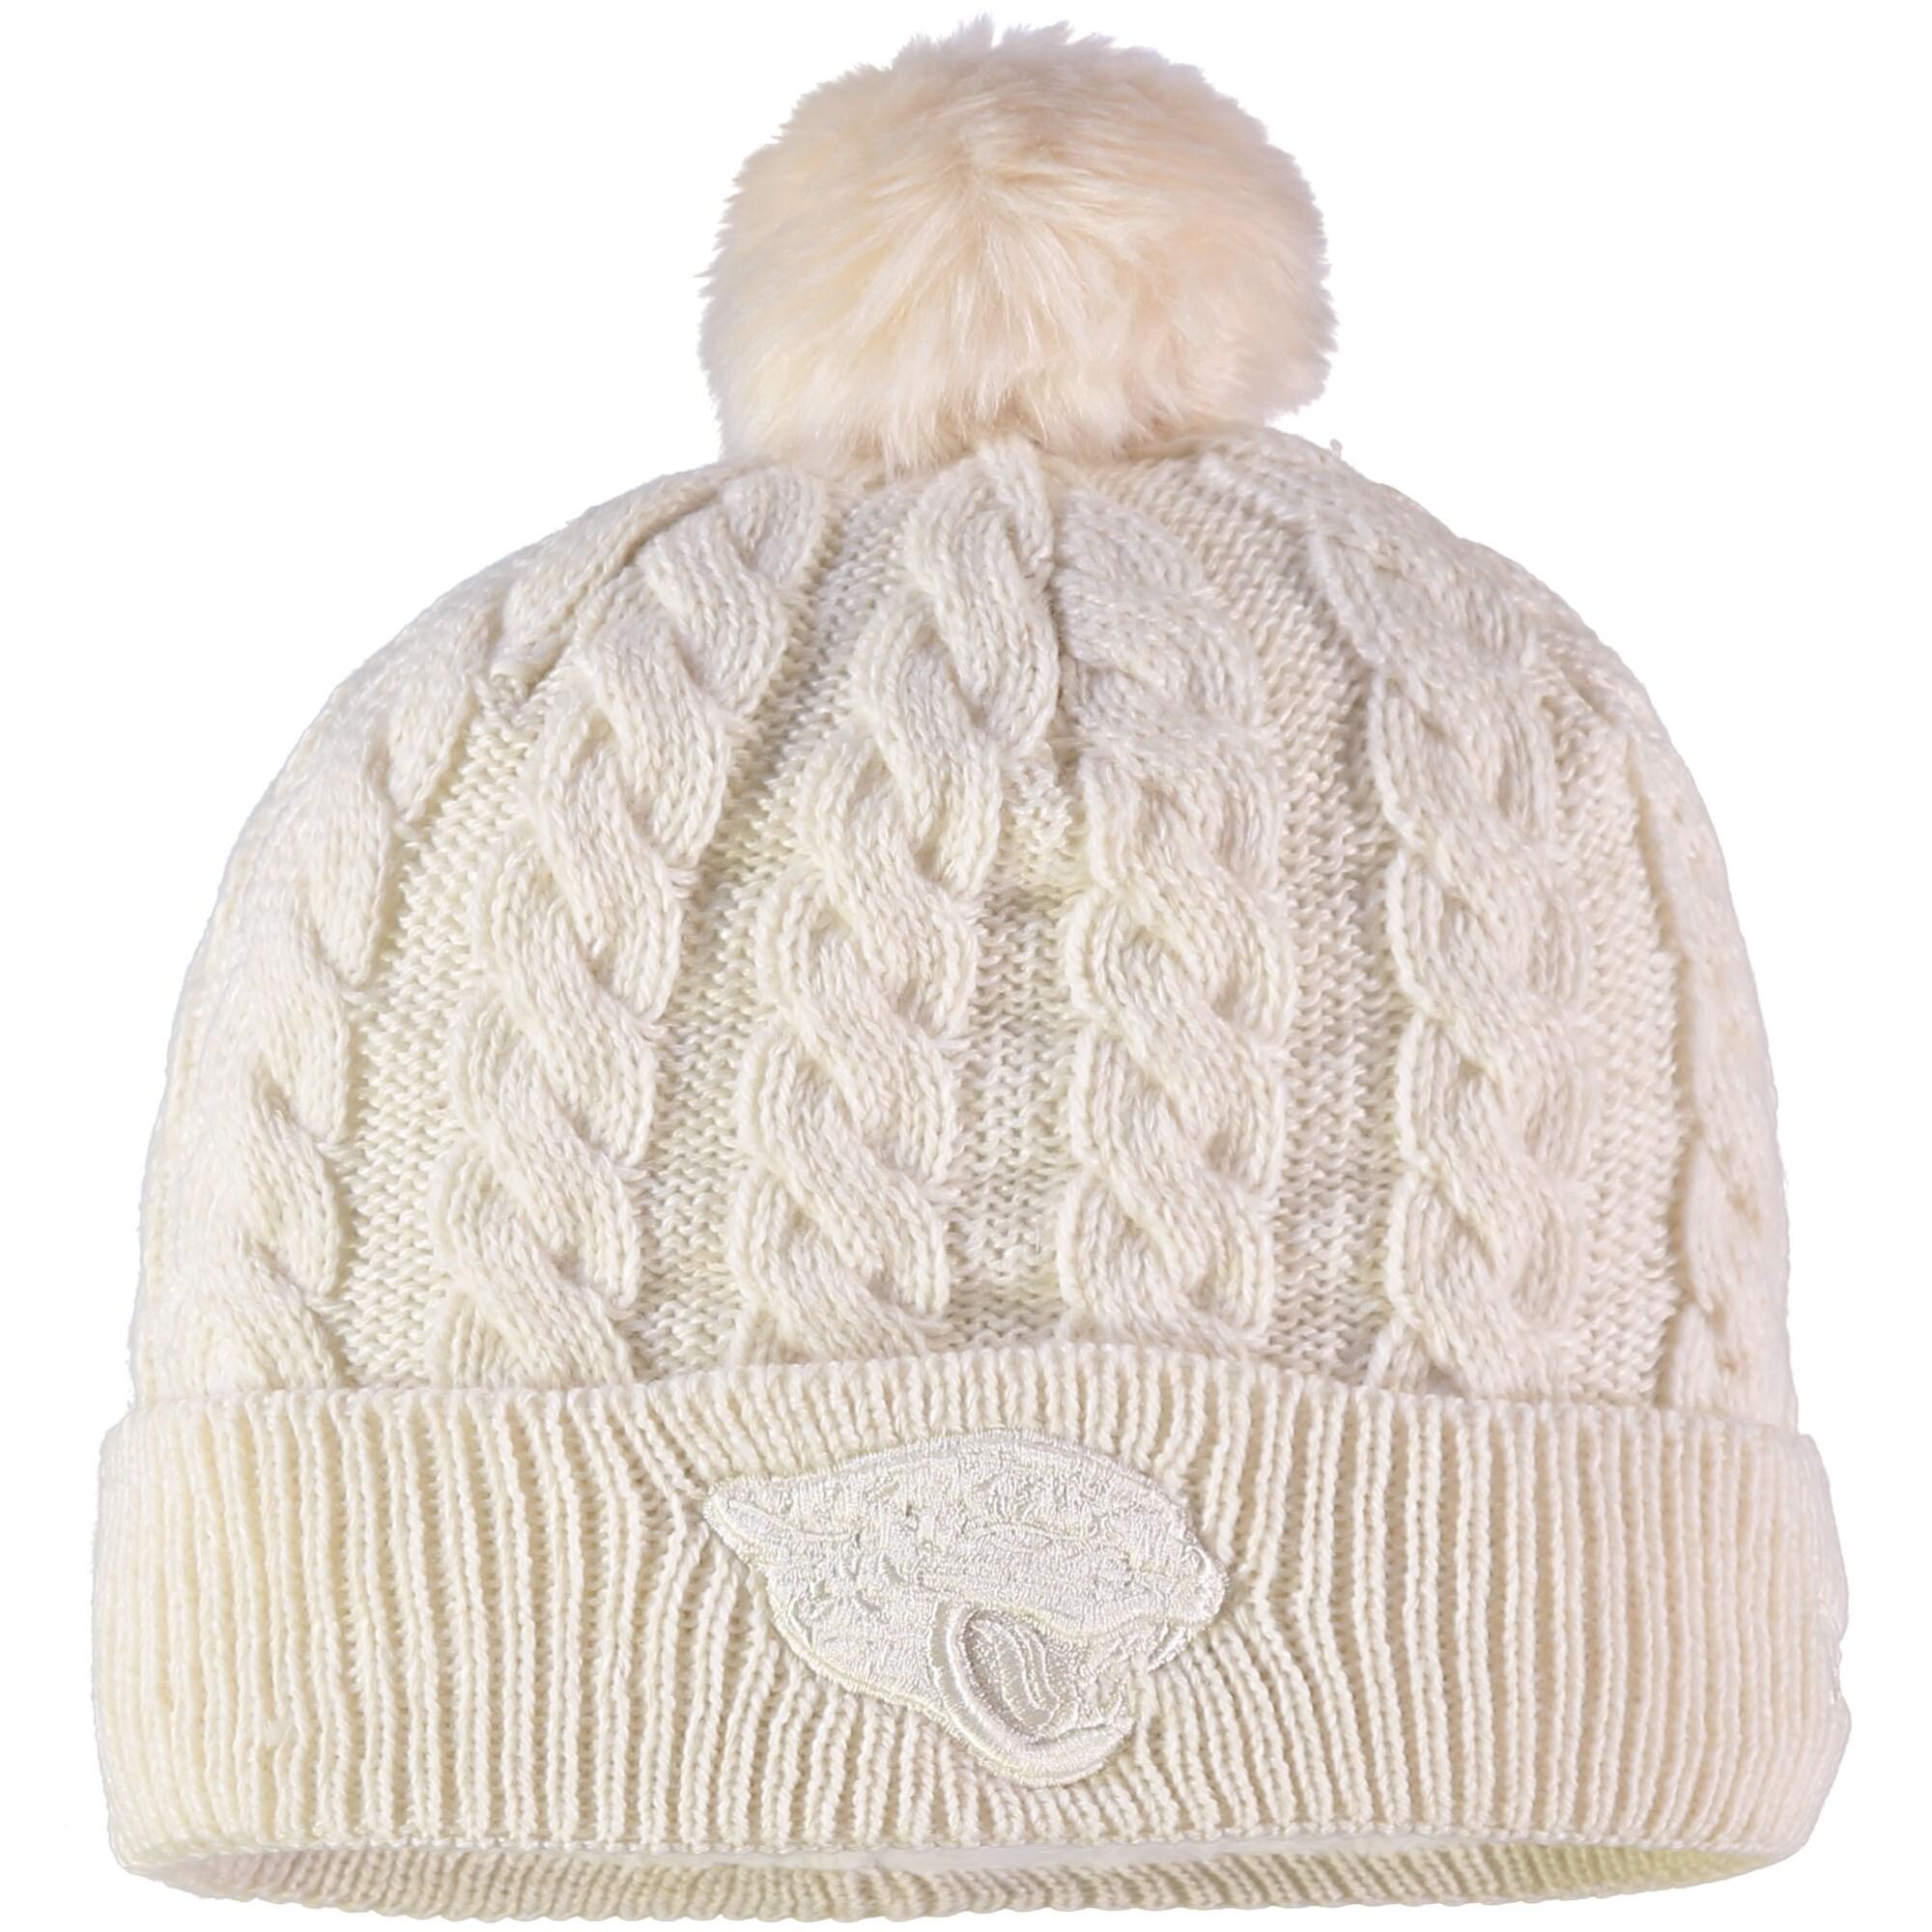 Jacksonville Jaguars New Era Women's Walcott Cuffed Knit Hat with Pom - Cream